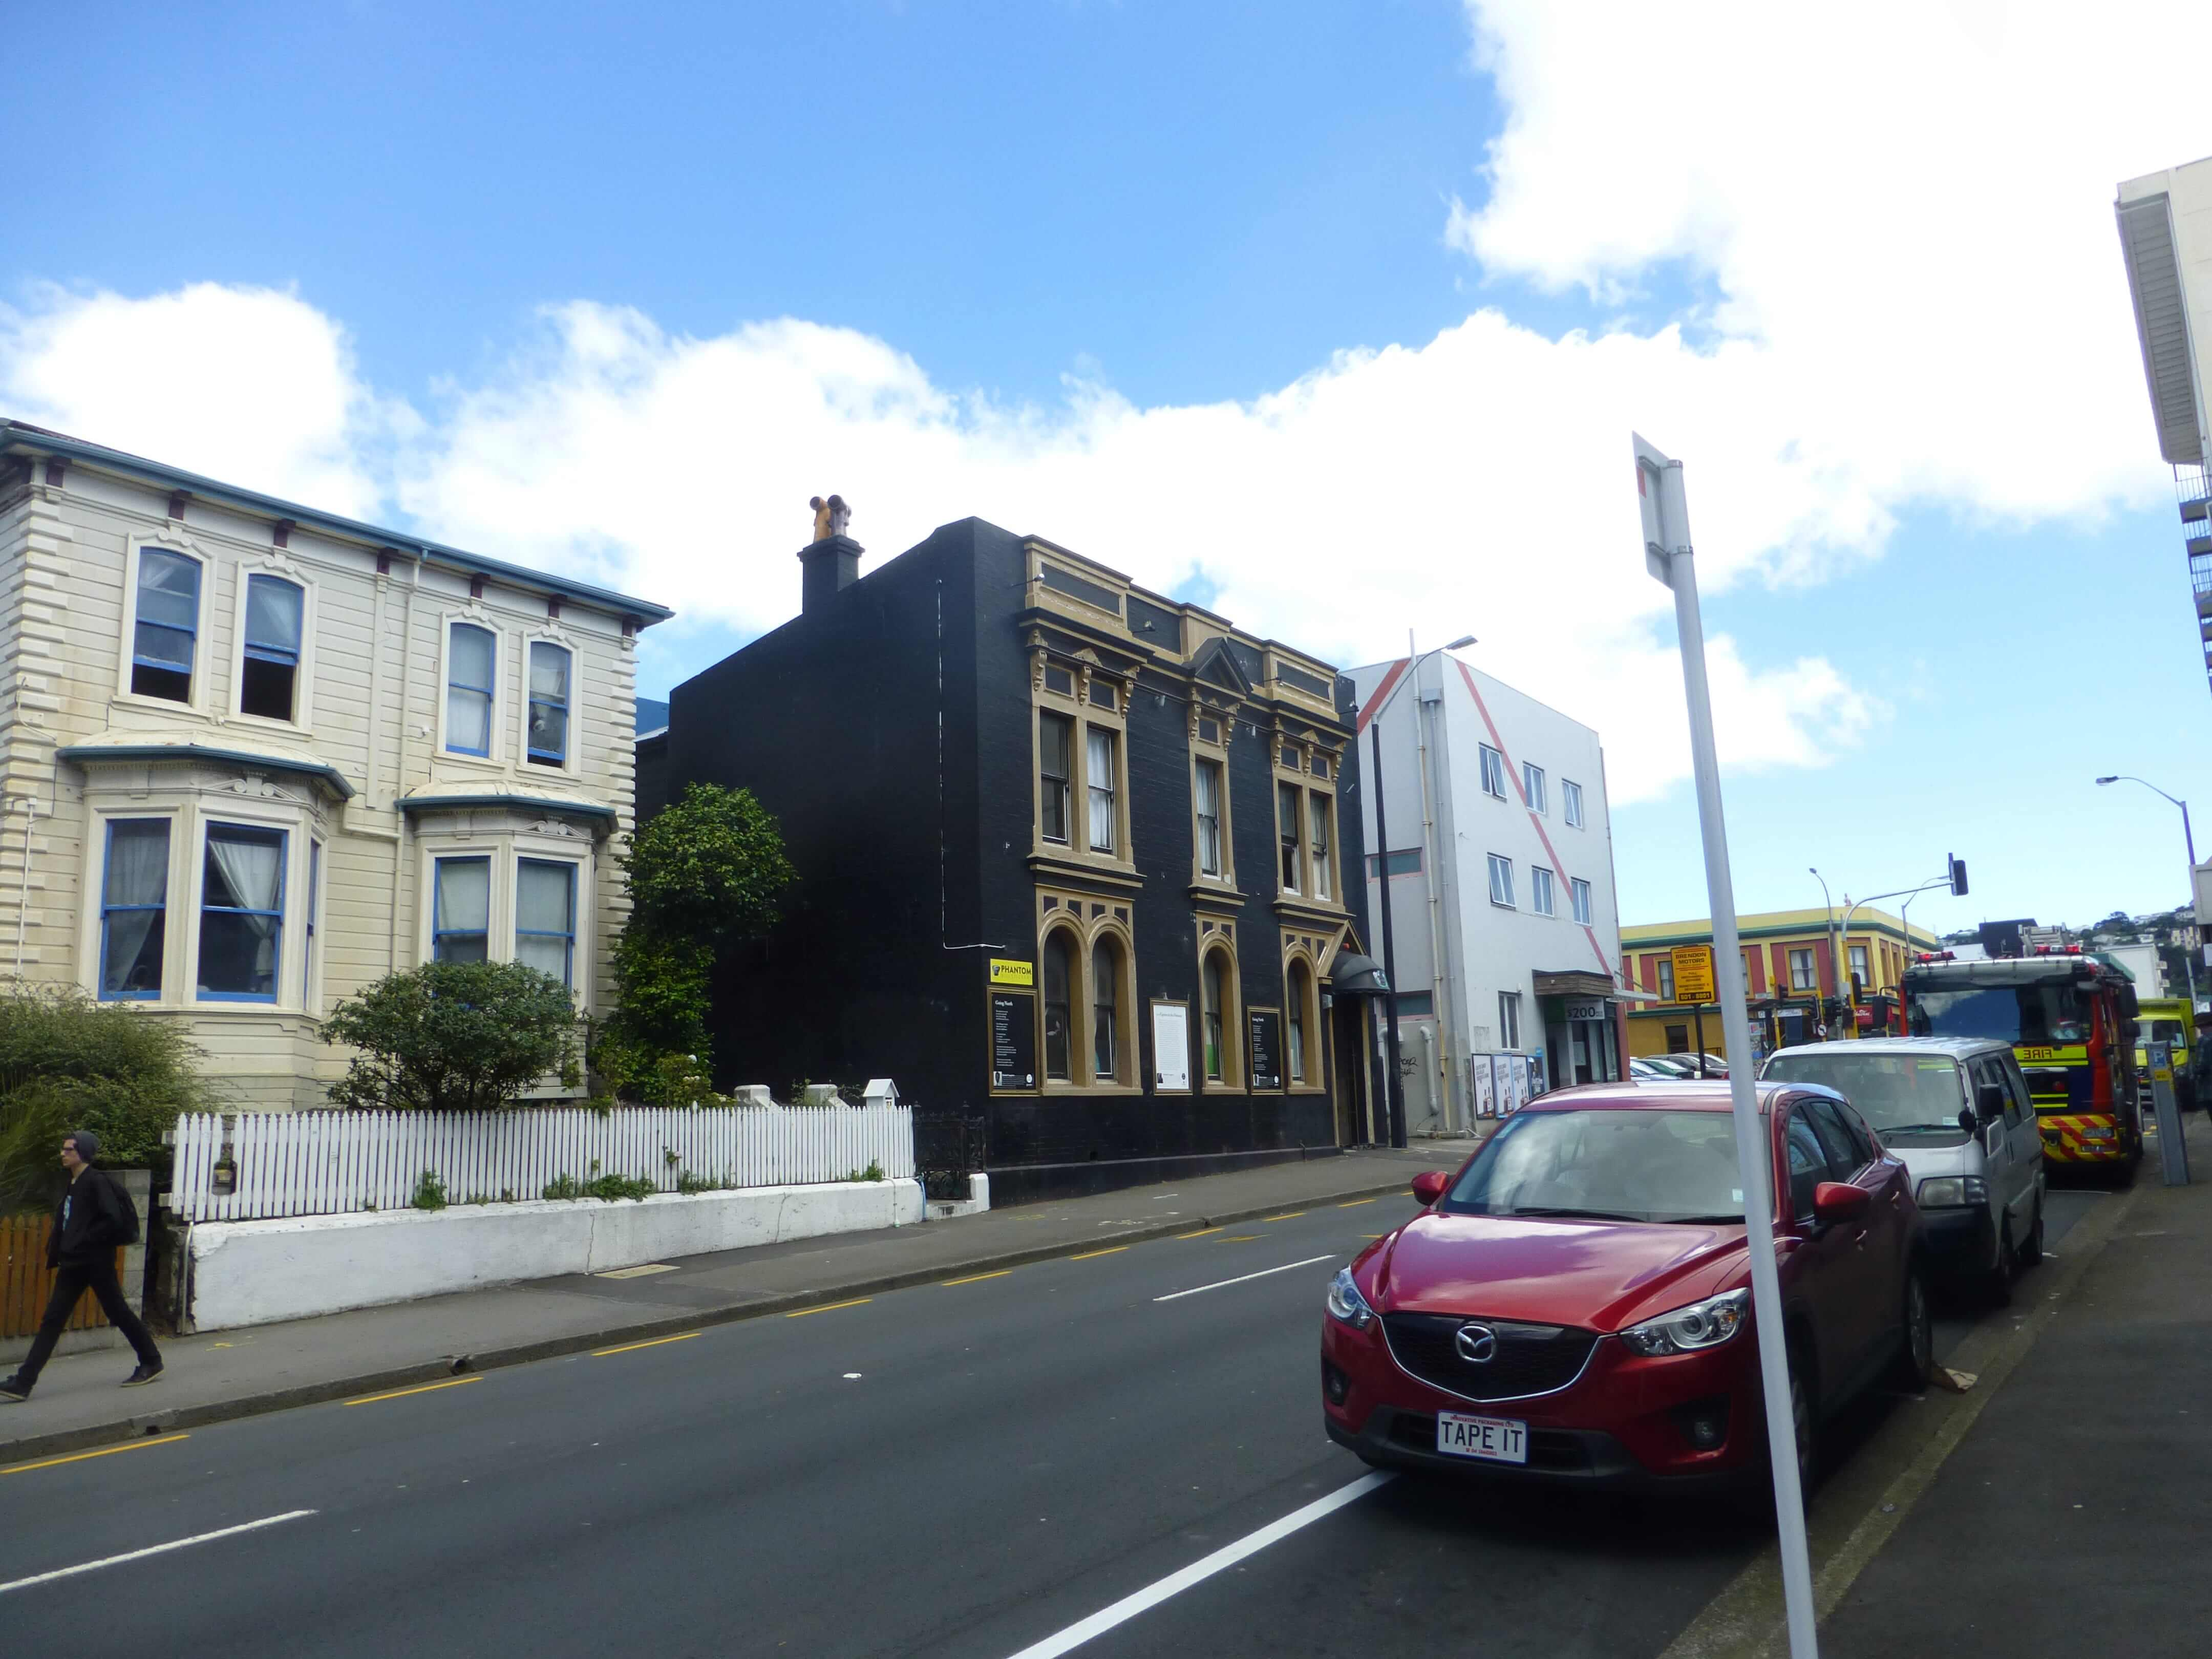 im Zentrum, Wellington, Neuseeland, Weit-weg.reisen 1